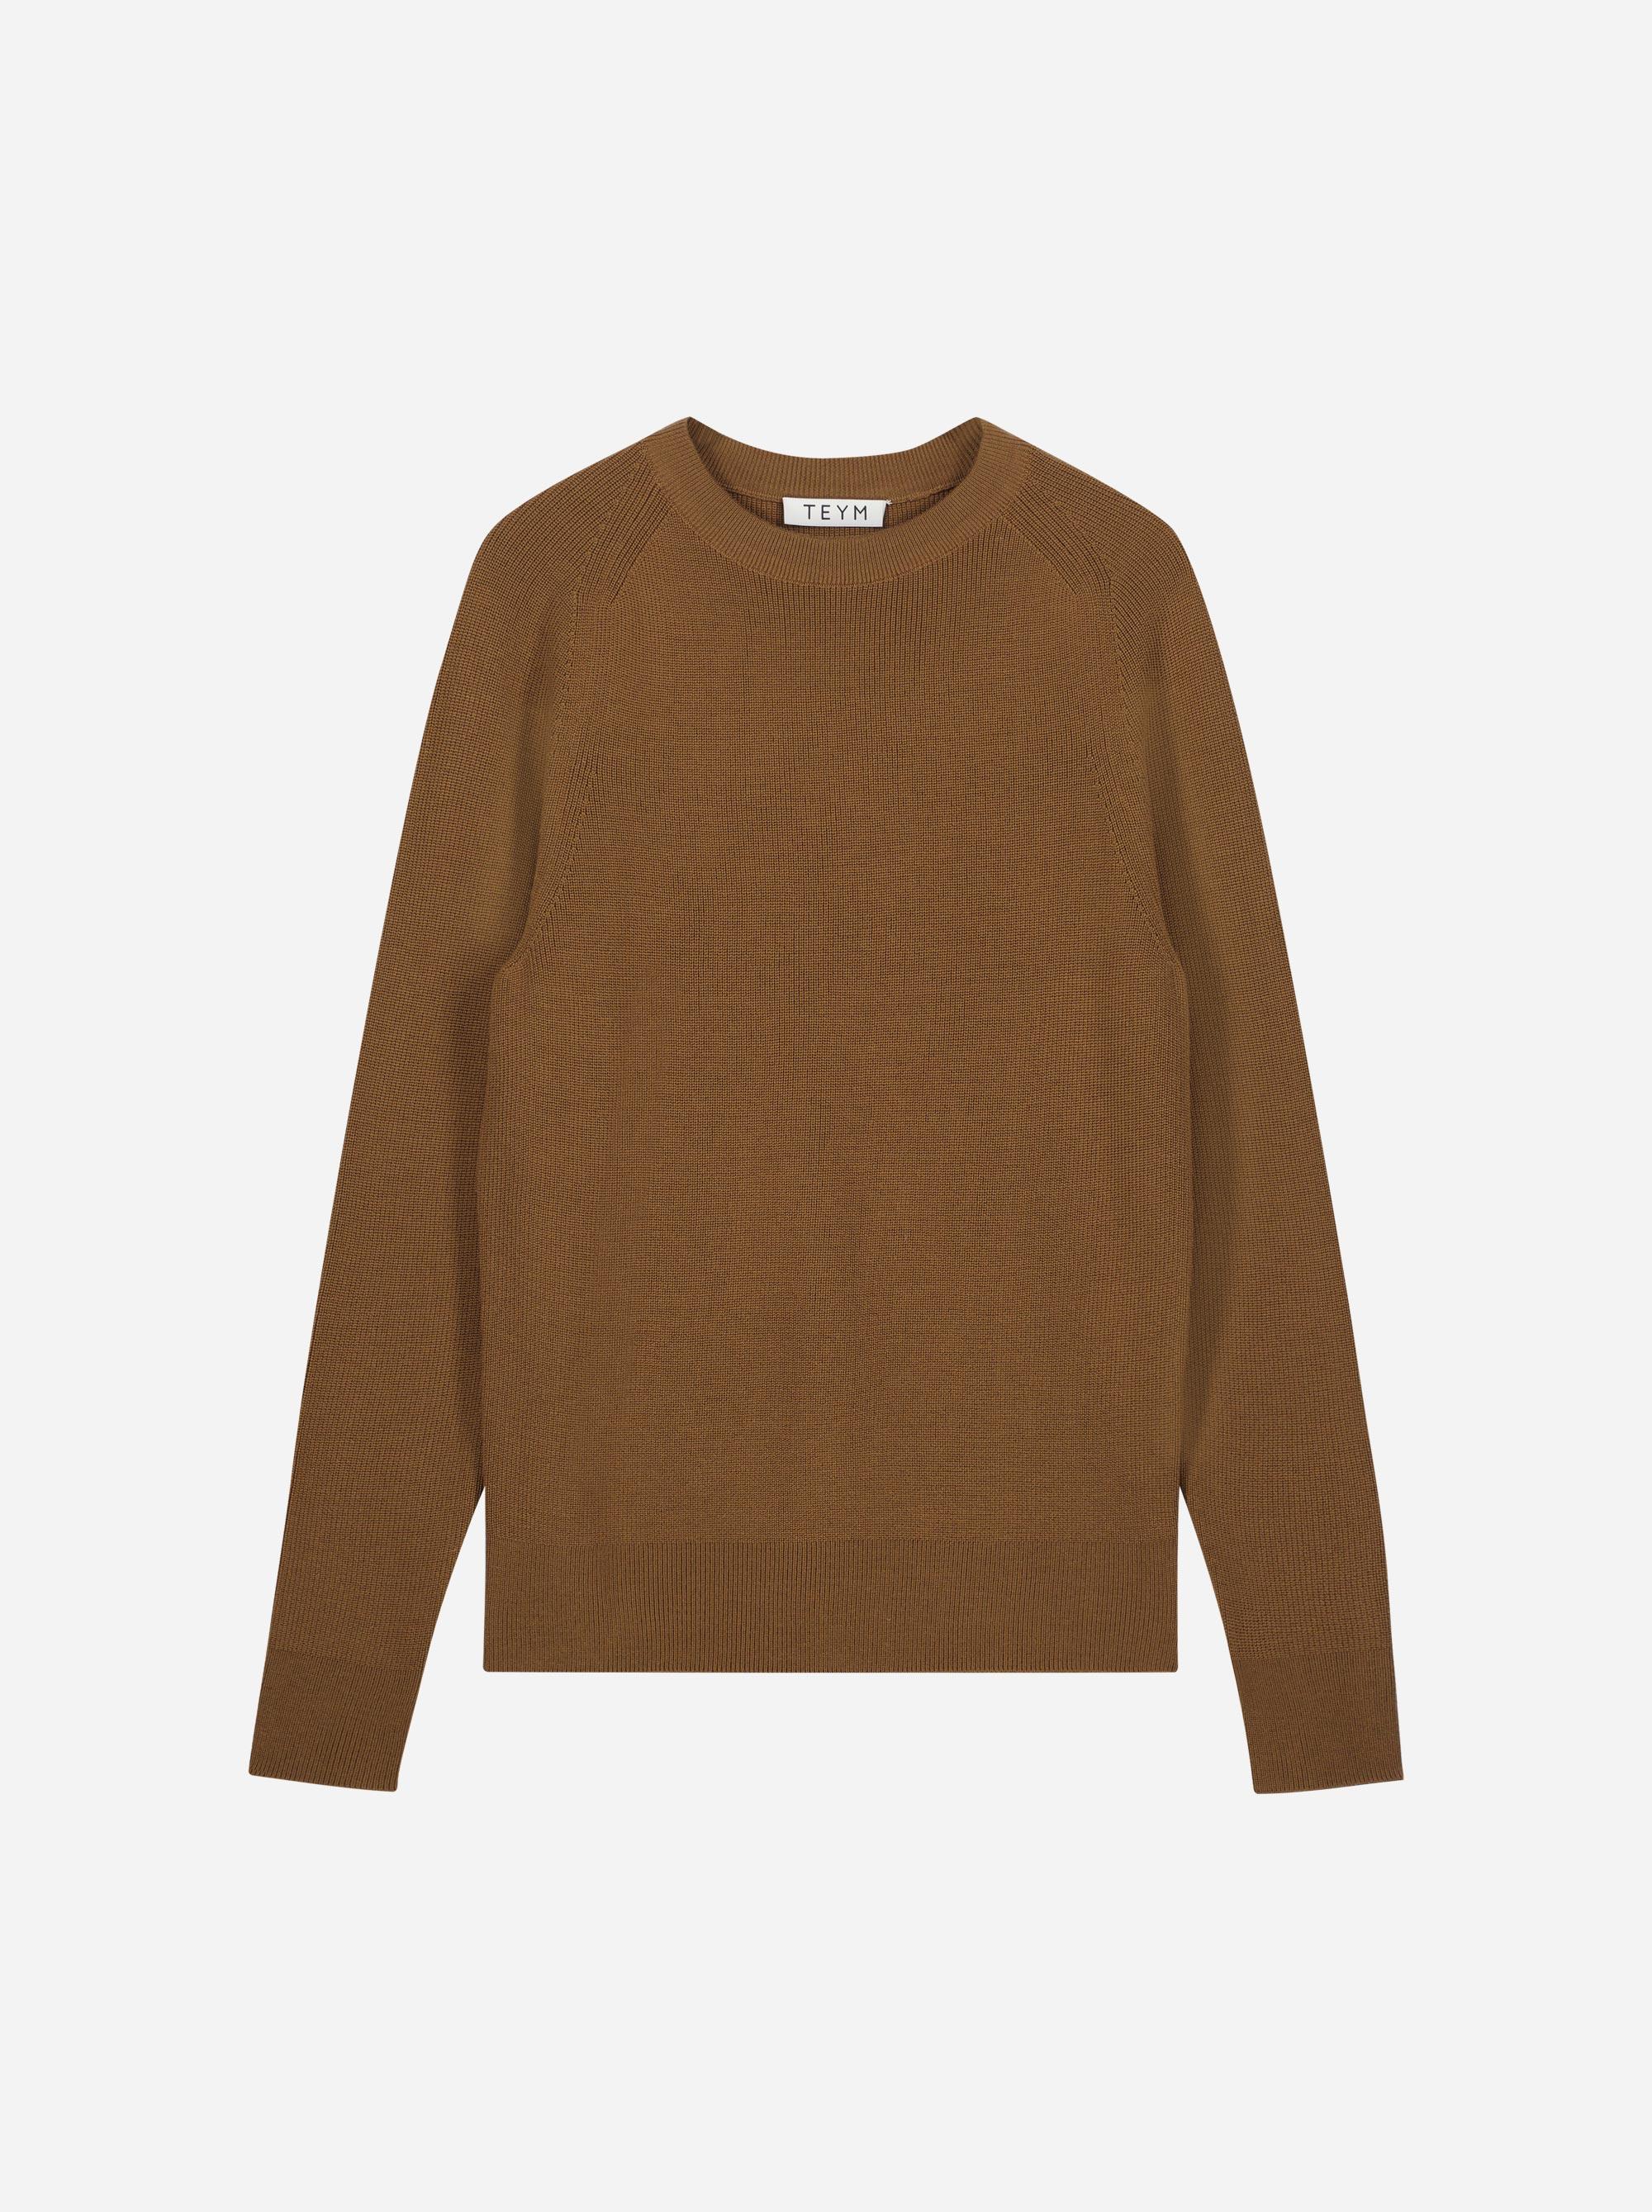 Teym_Merino-Sweater-Crewneck_Brown_front_1